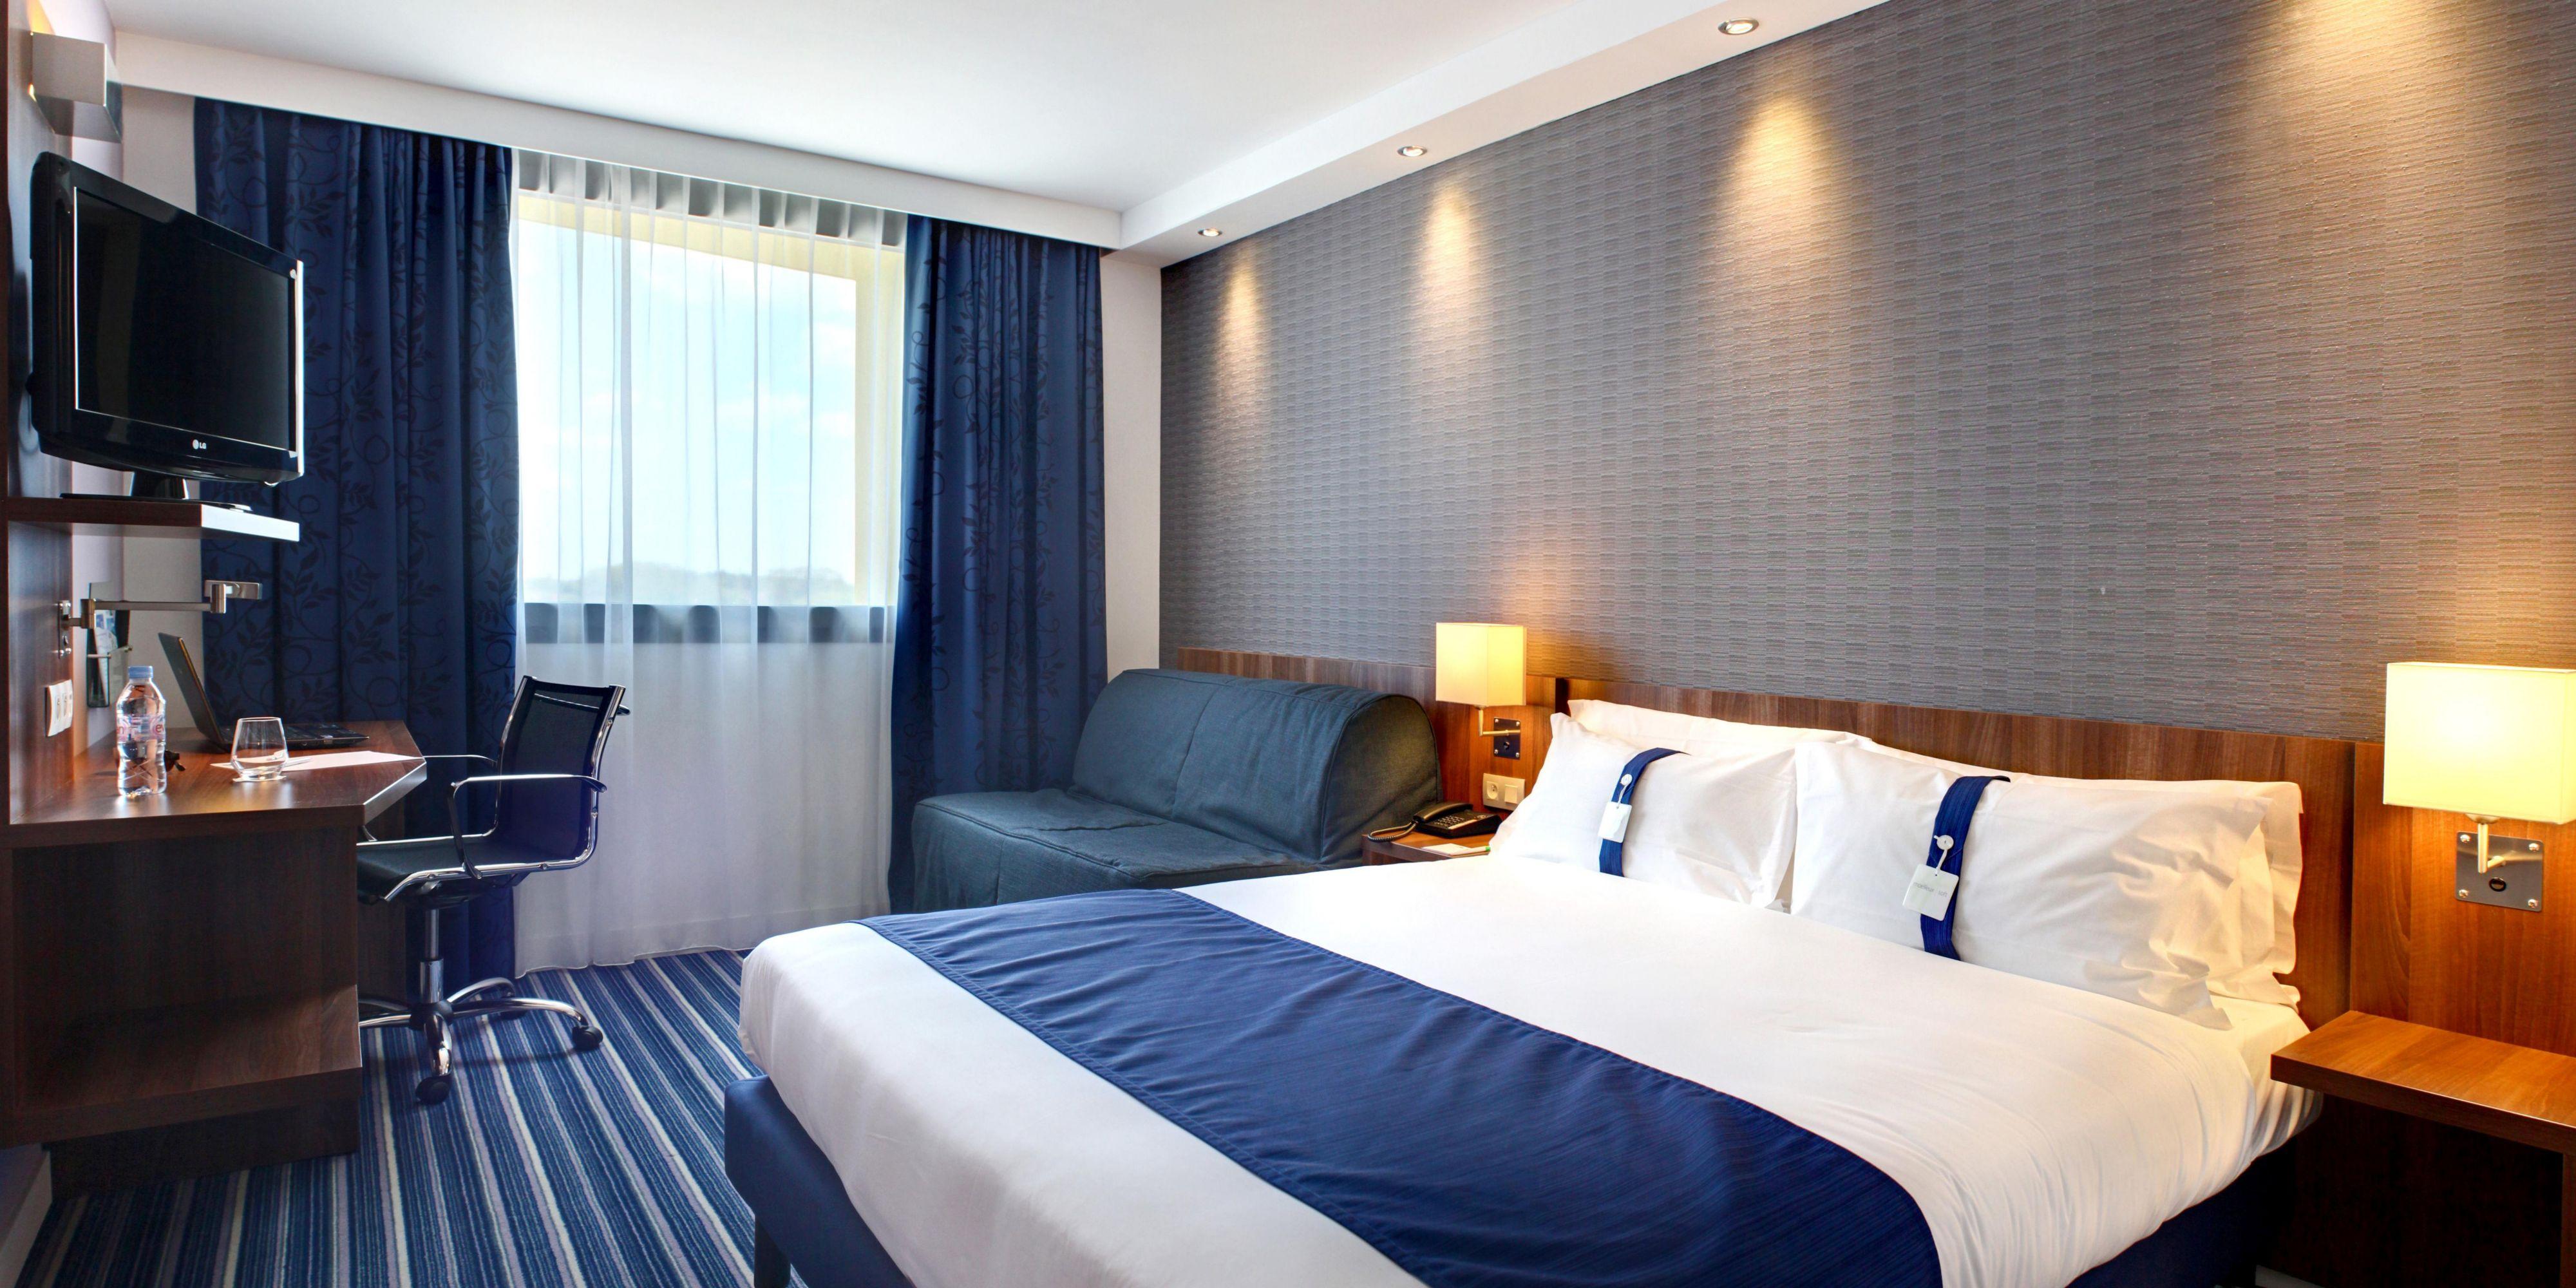 Holiday Inn Express Montpellier Odysseum Hotel by IHG